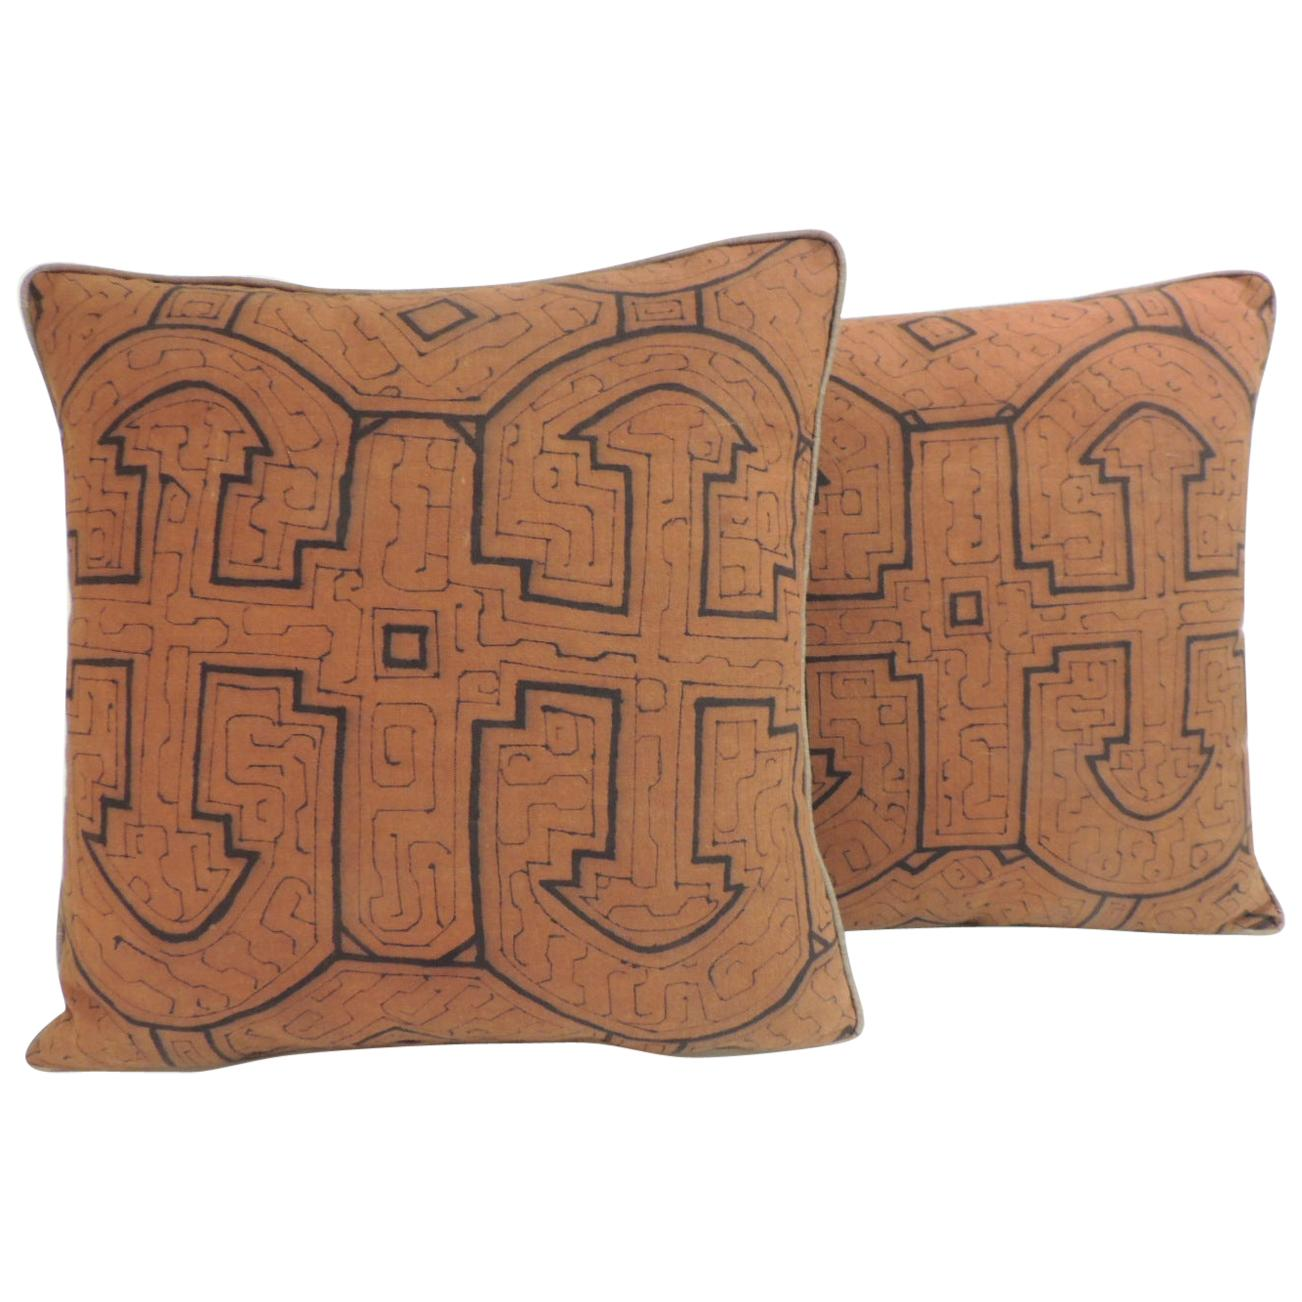 Graphic Tribal Peruvian Textile In Orange And Black Decorative Pillows 3 Pair